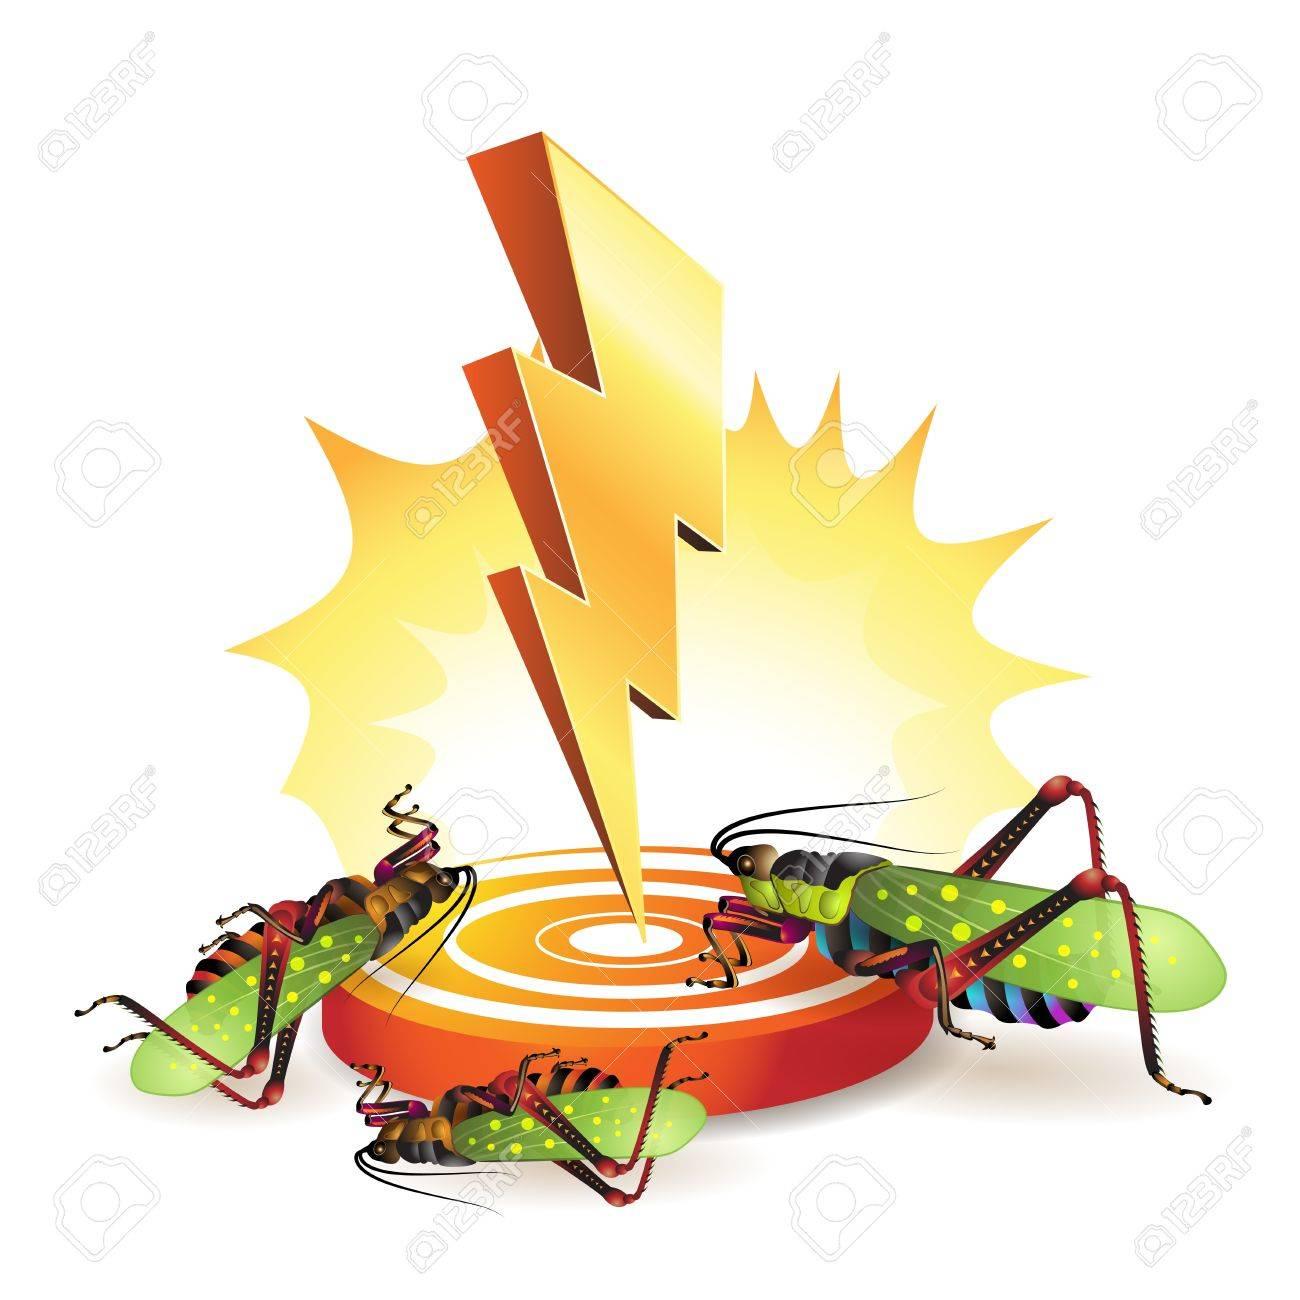 Powerful lightning bolt targeting grasshoppers Stock Vector - 9508499